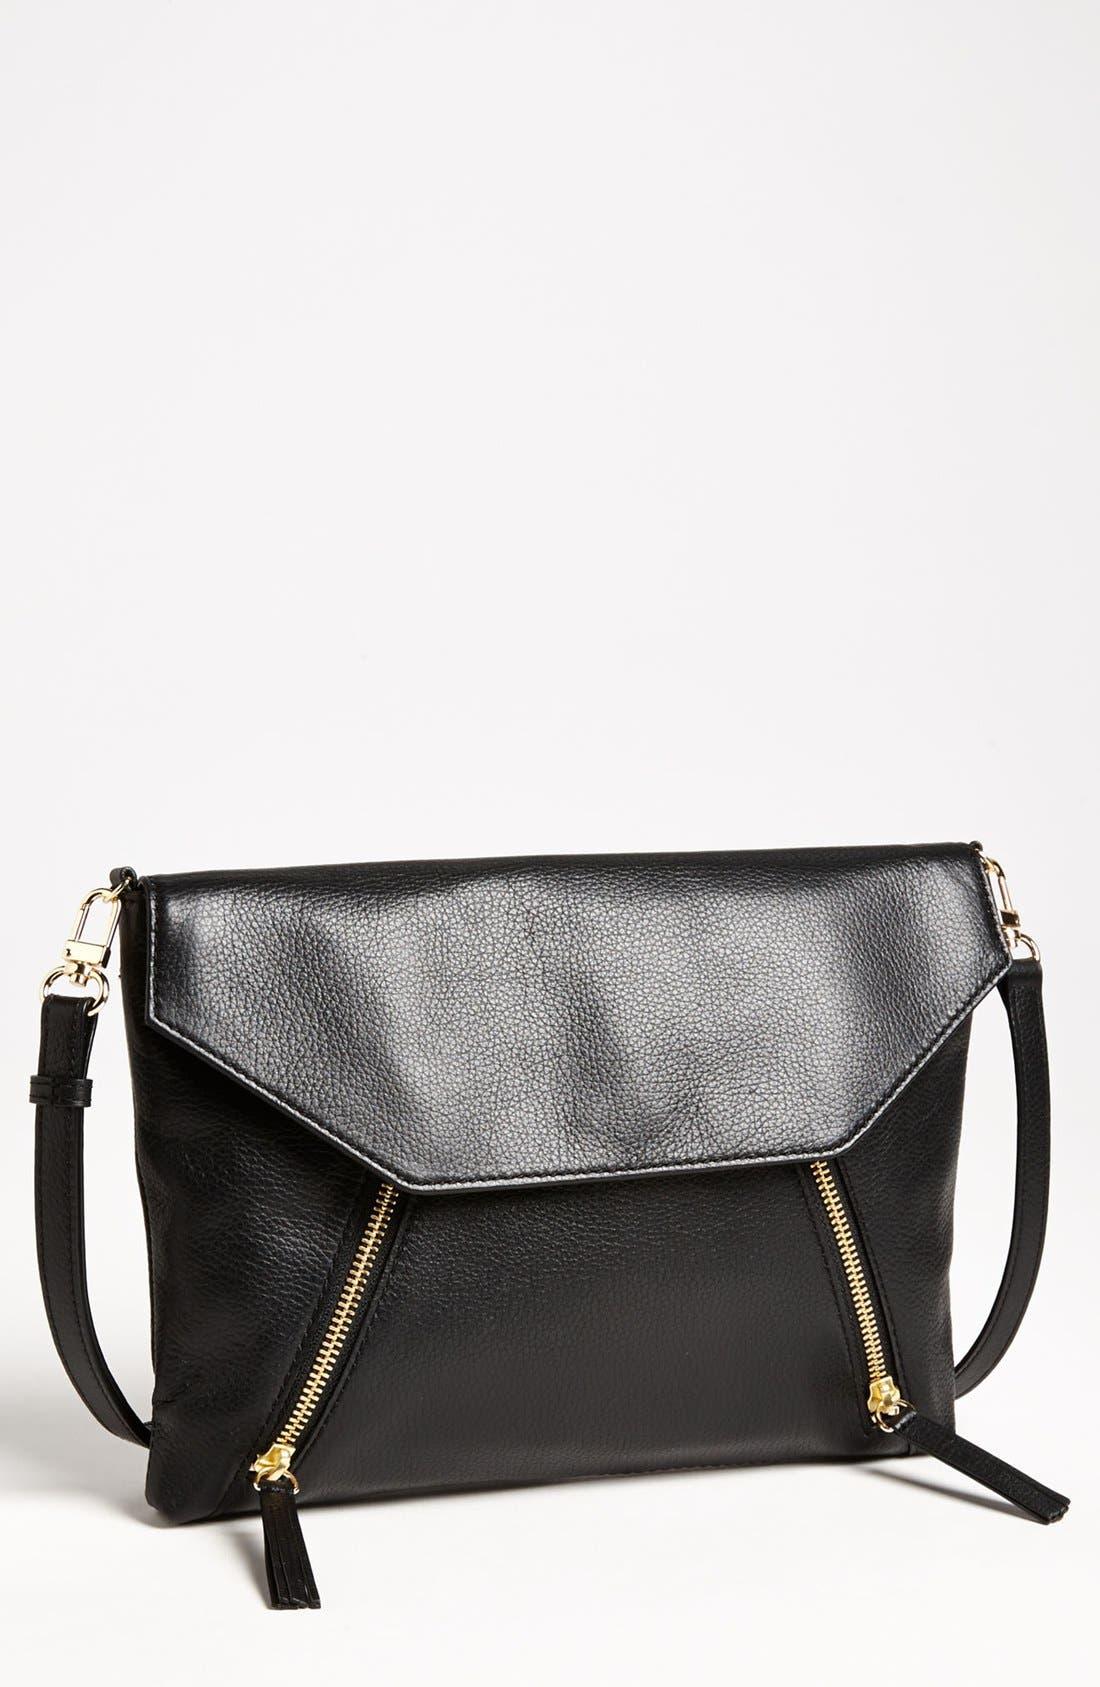 Main Image - Halogen Envelope Crossbody Bag